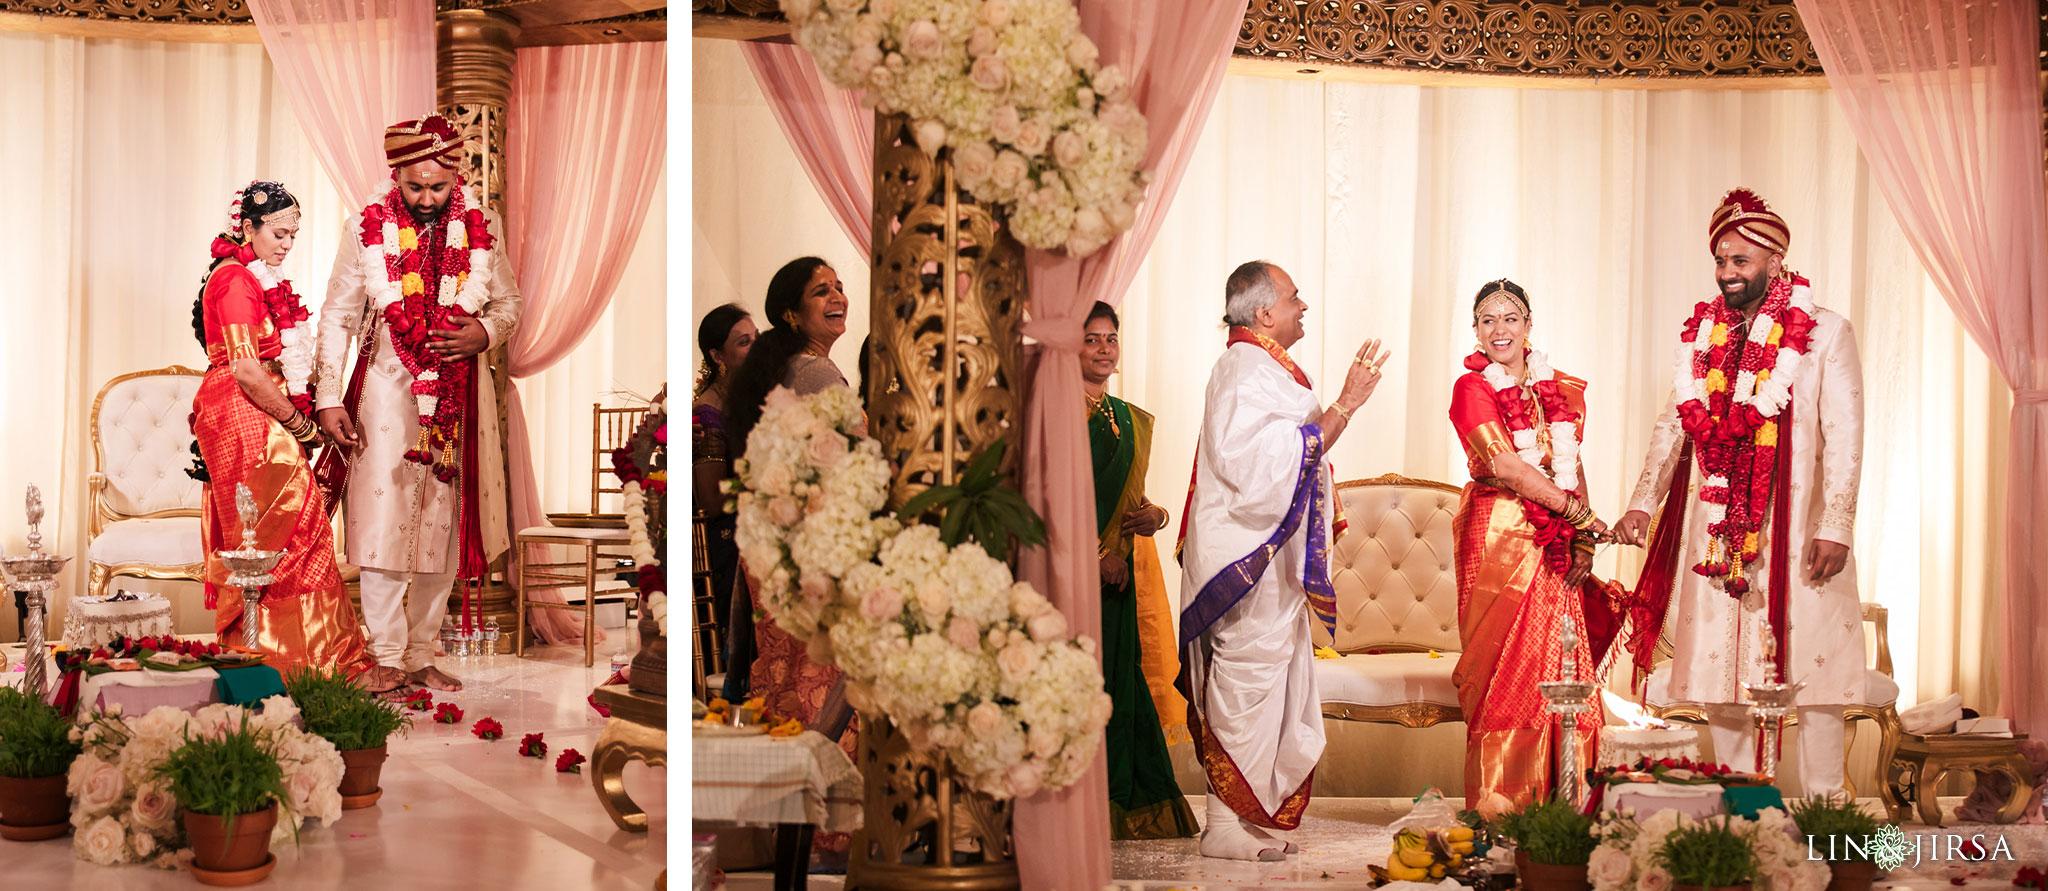 18 long beach hyatt south indian wedding photography